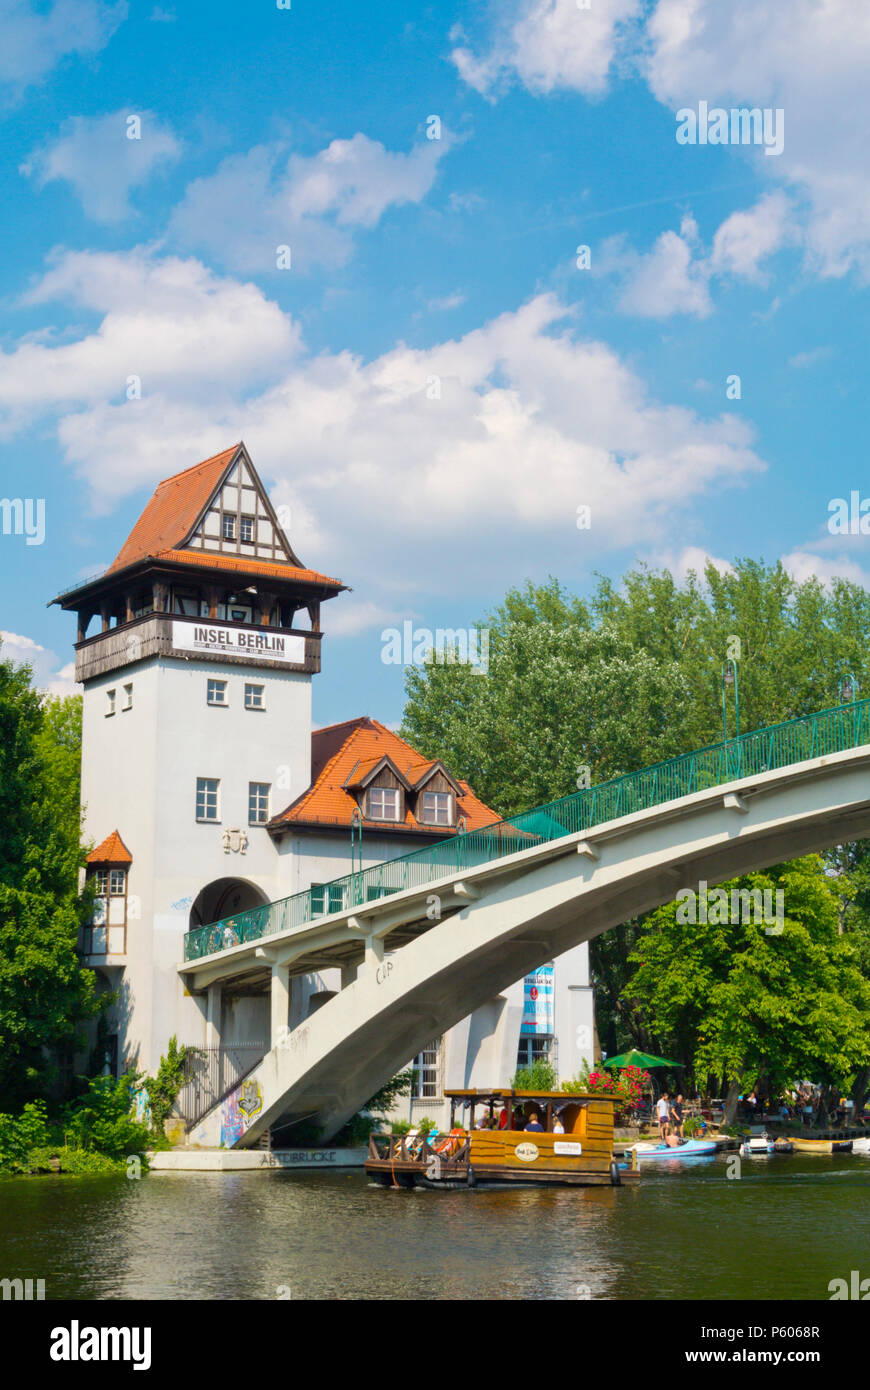 Bridge leading to Insel der Jugend, Treptower Park, Alt-Treptow, Berlin, Germany - Stock Image